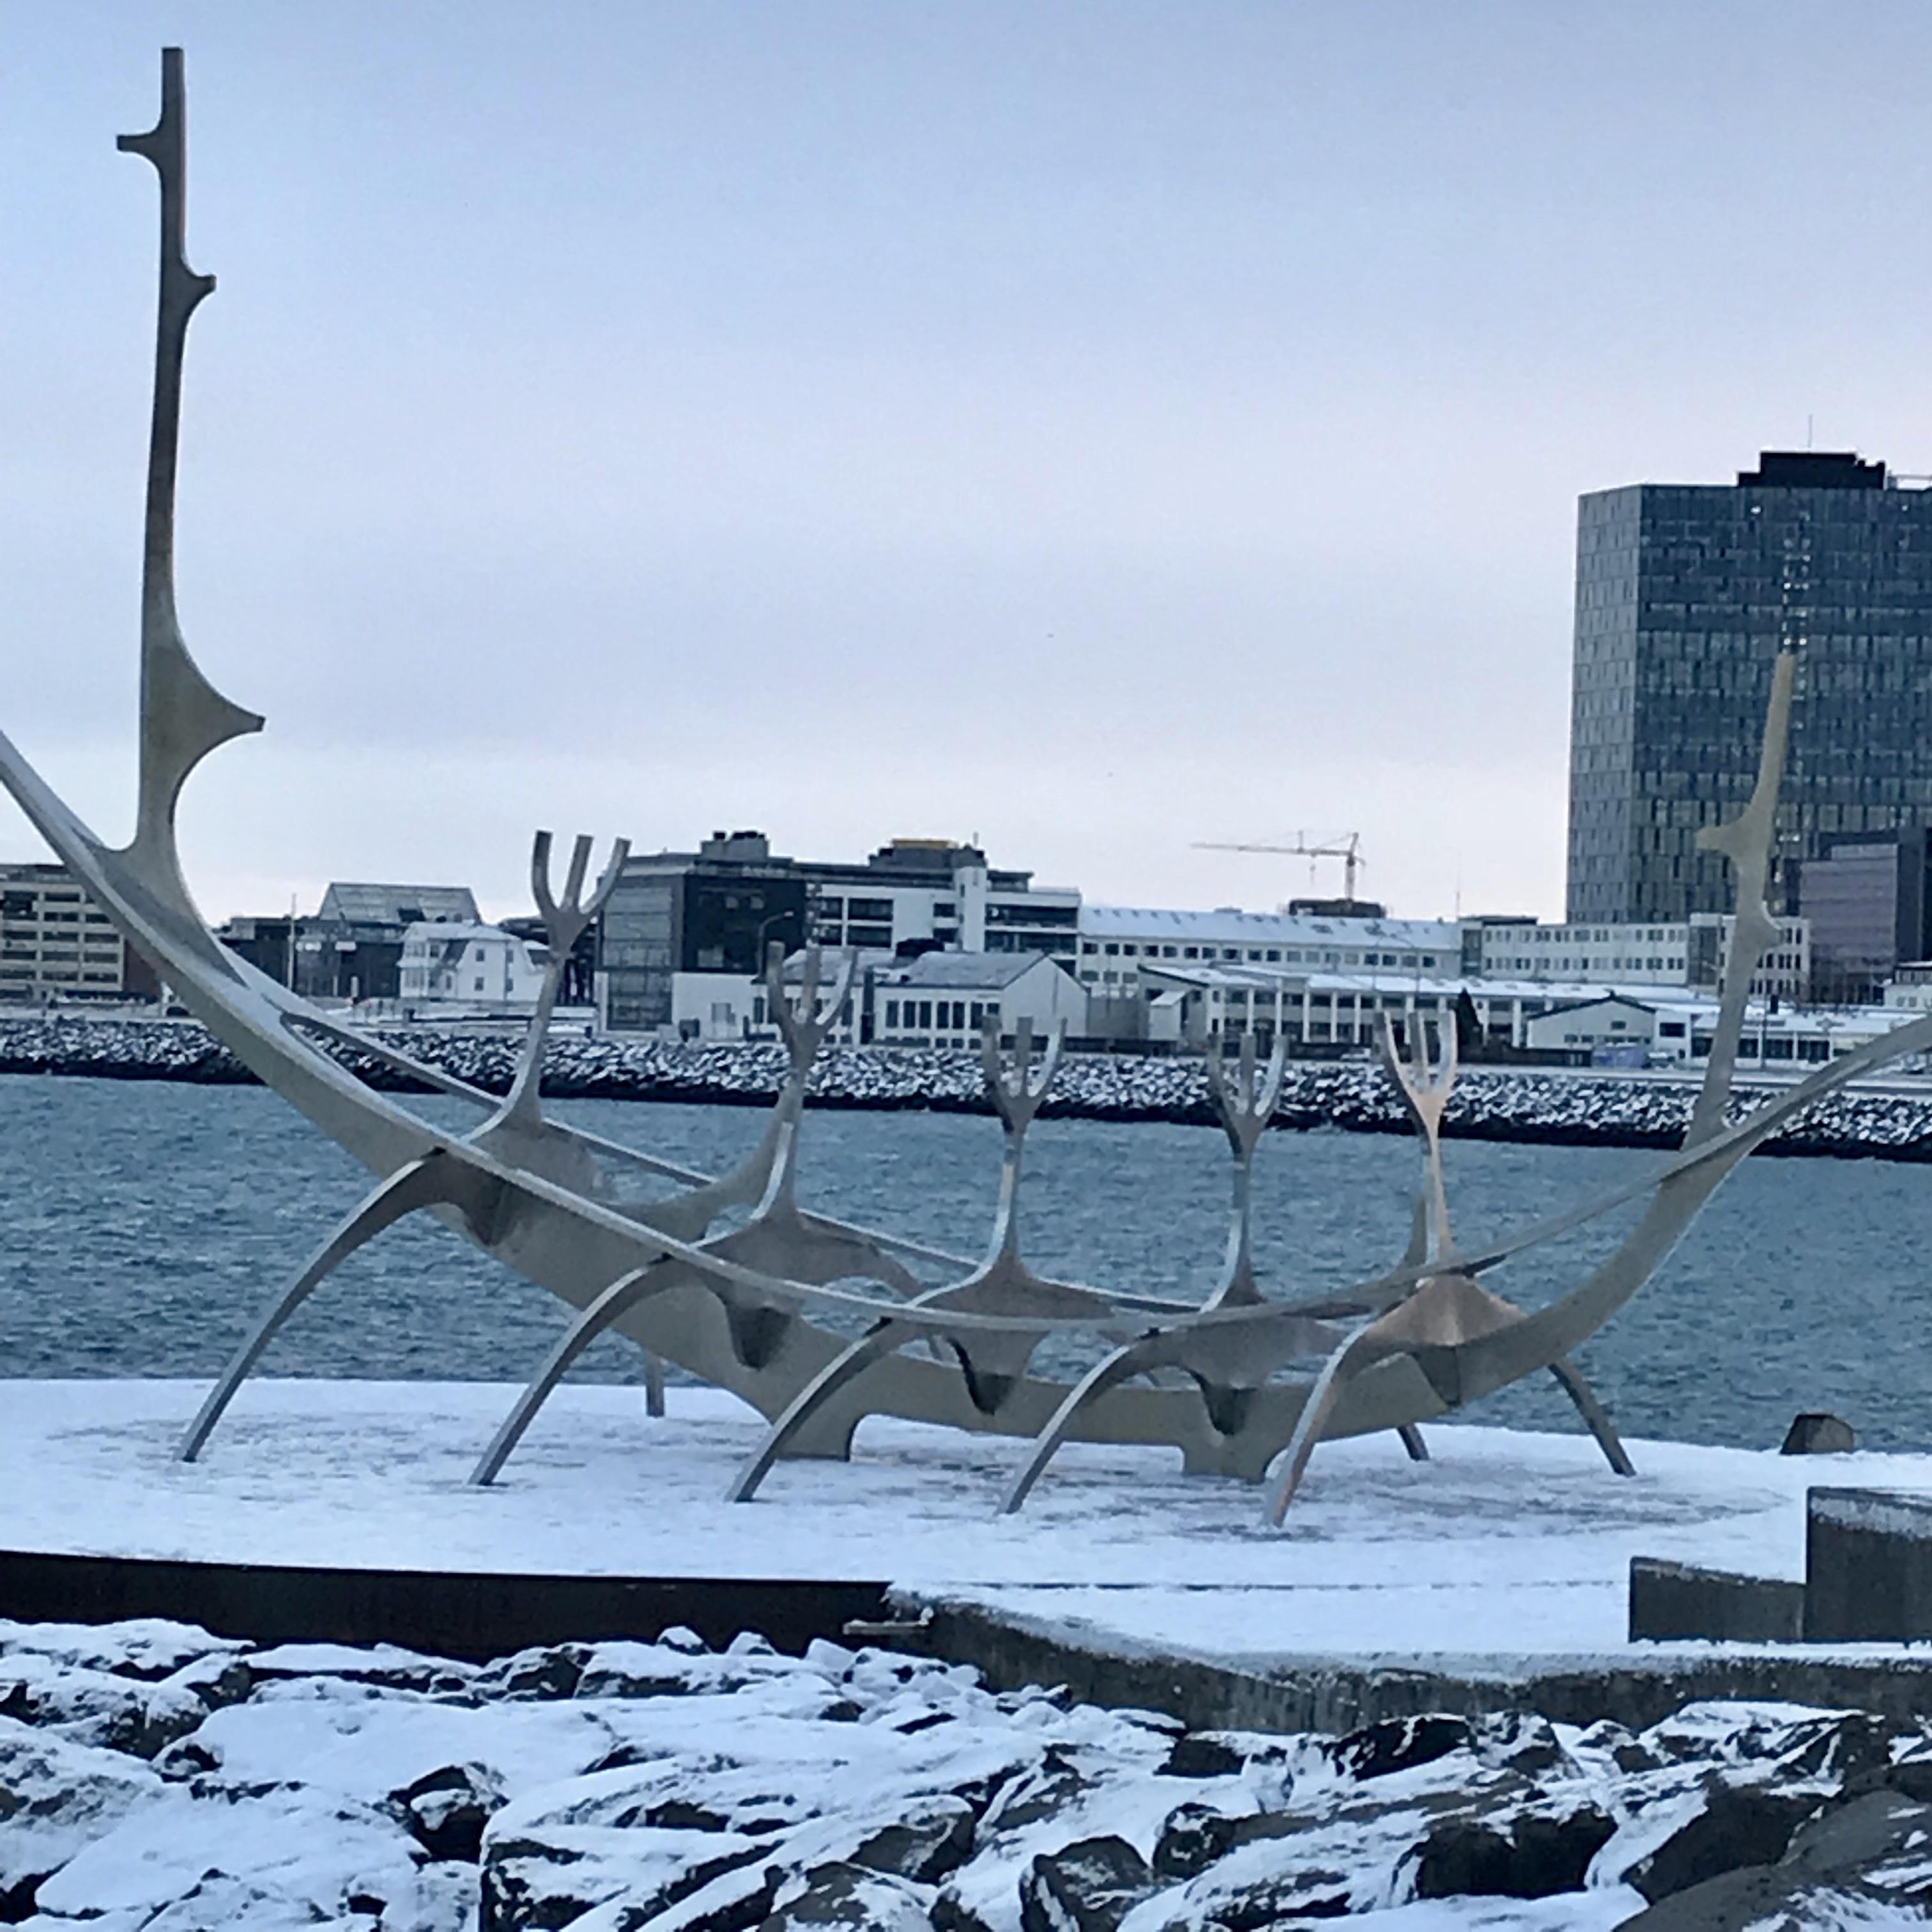 Reykjavik Iceland sun voyager